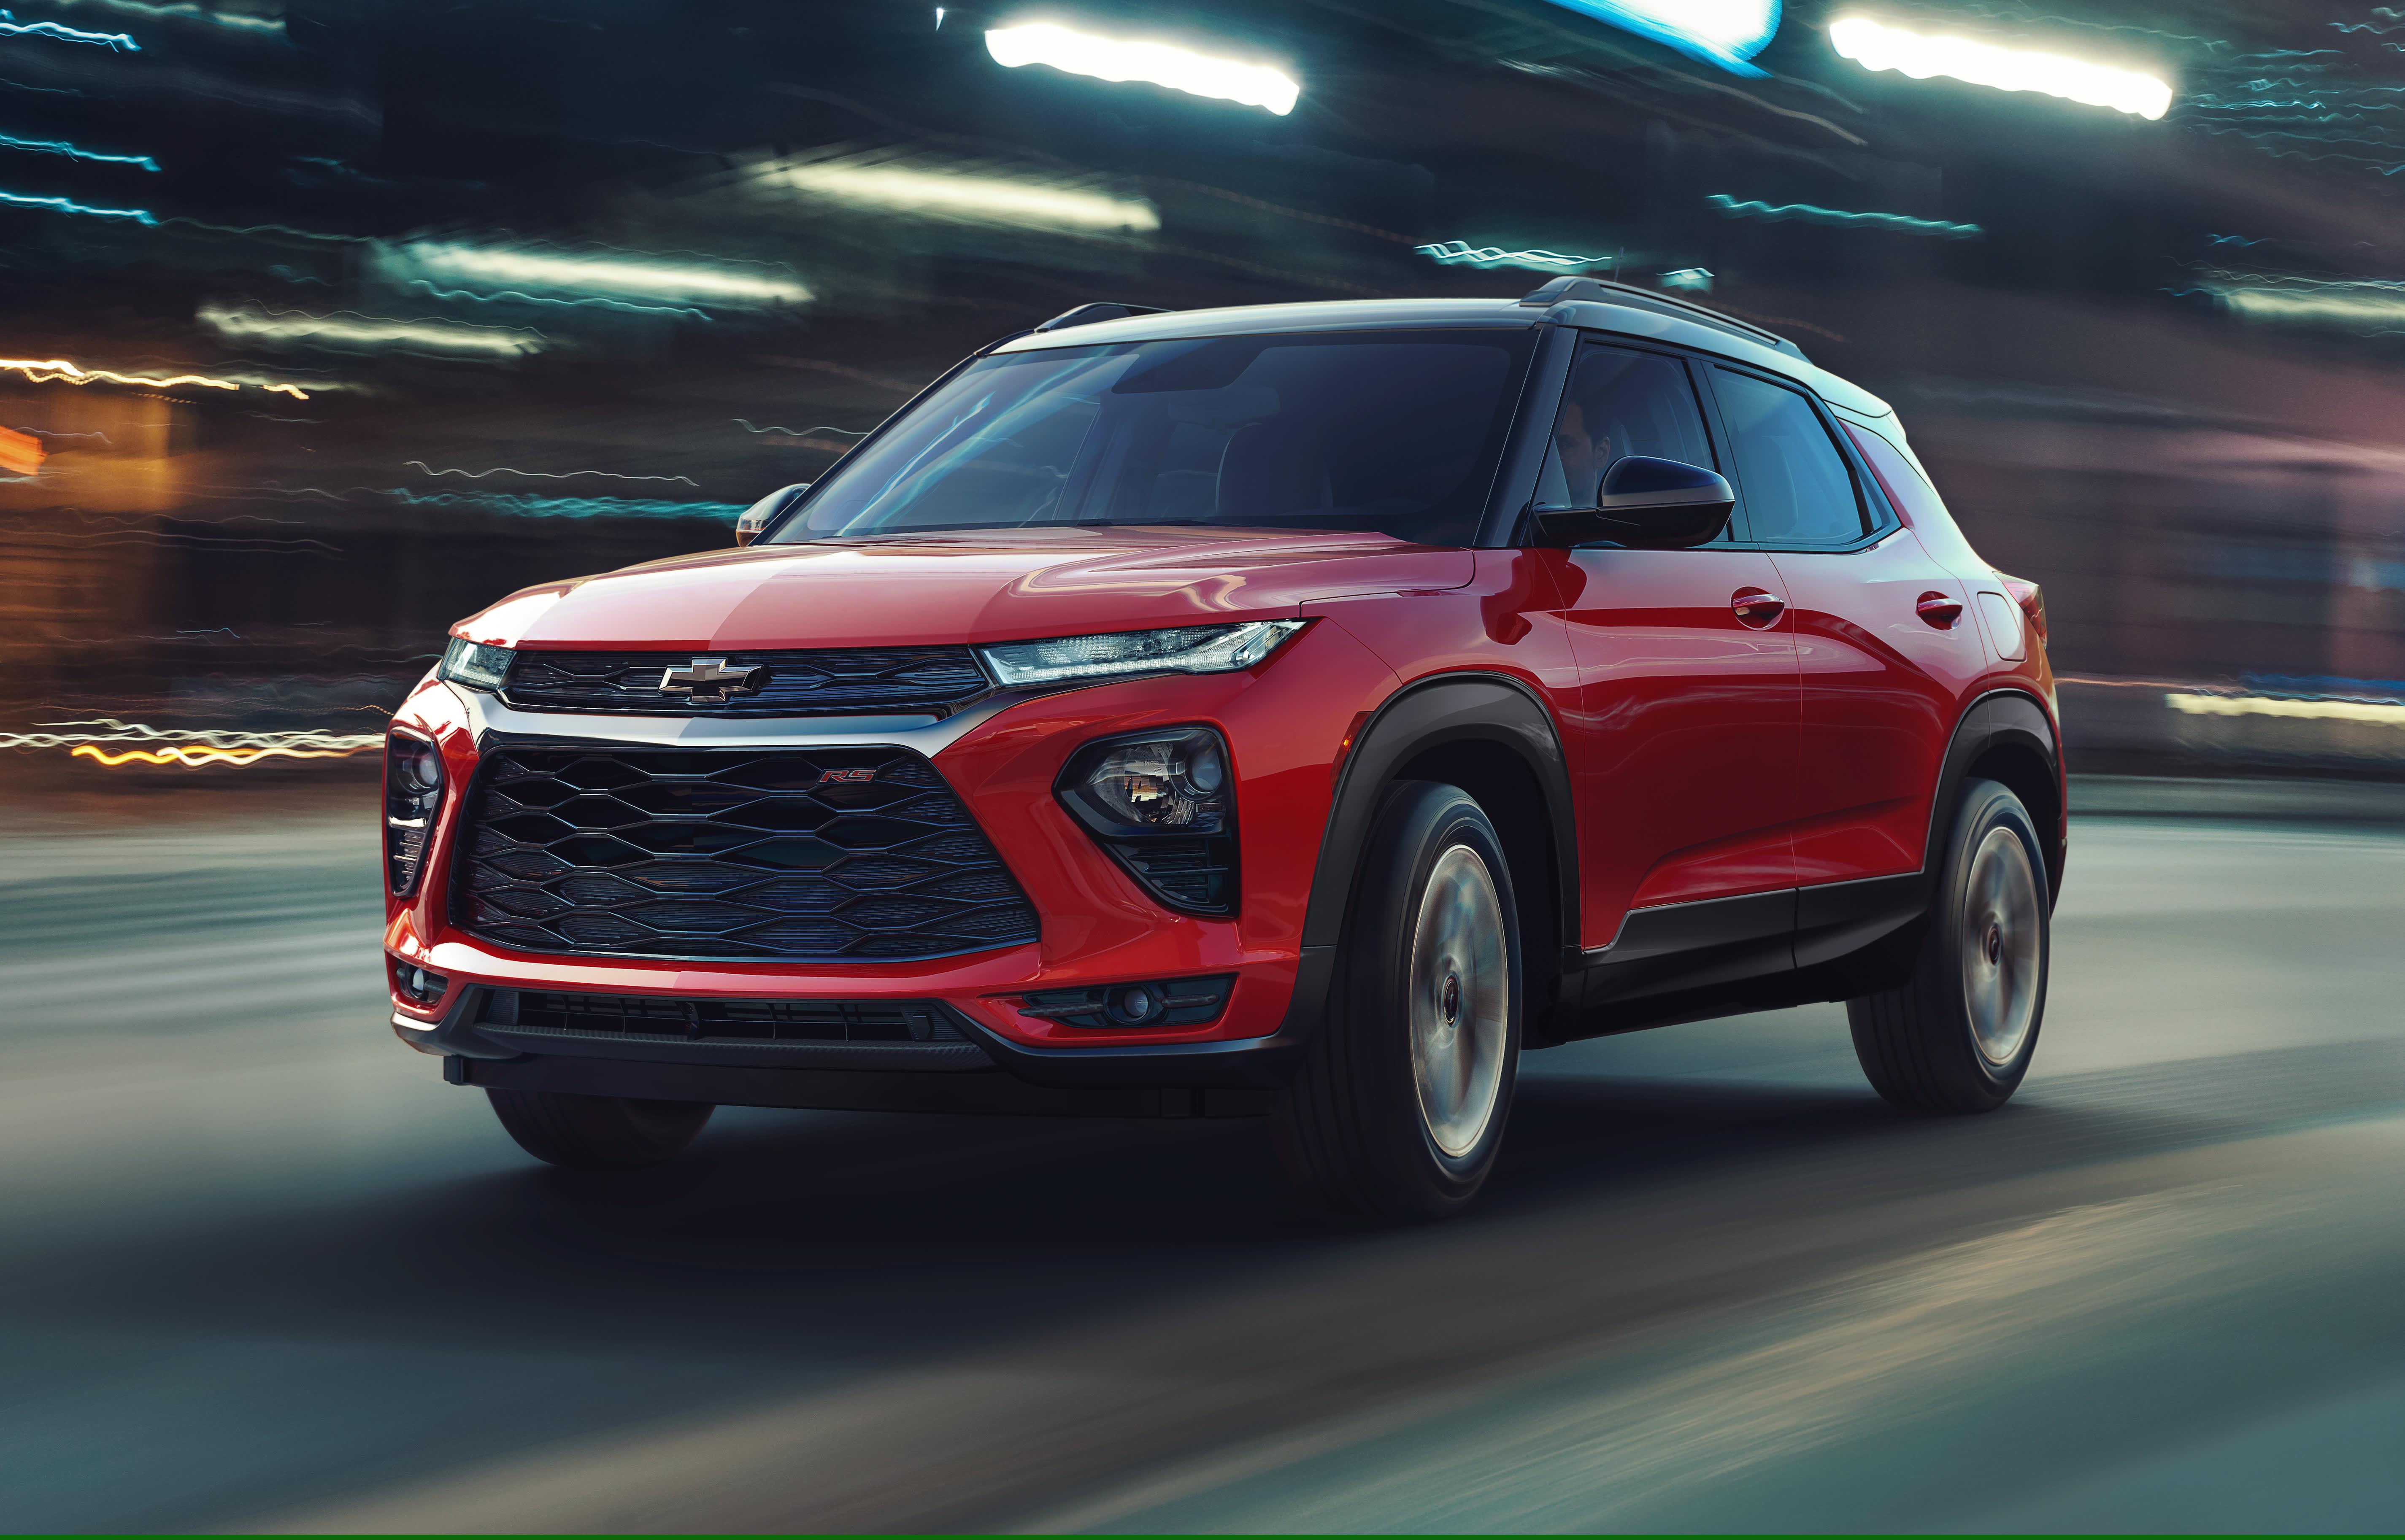 GM, Hyundai and Kia escape US auto tariffs on South Korean-made cars